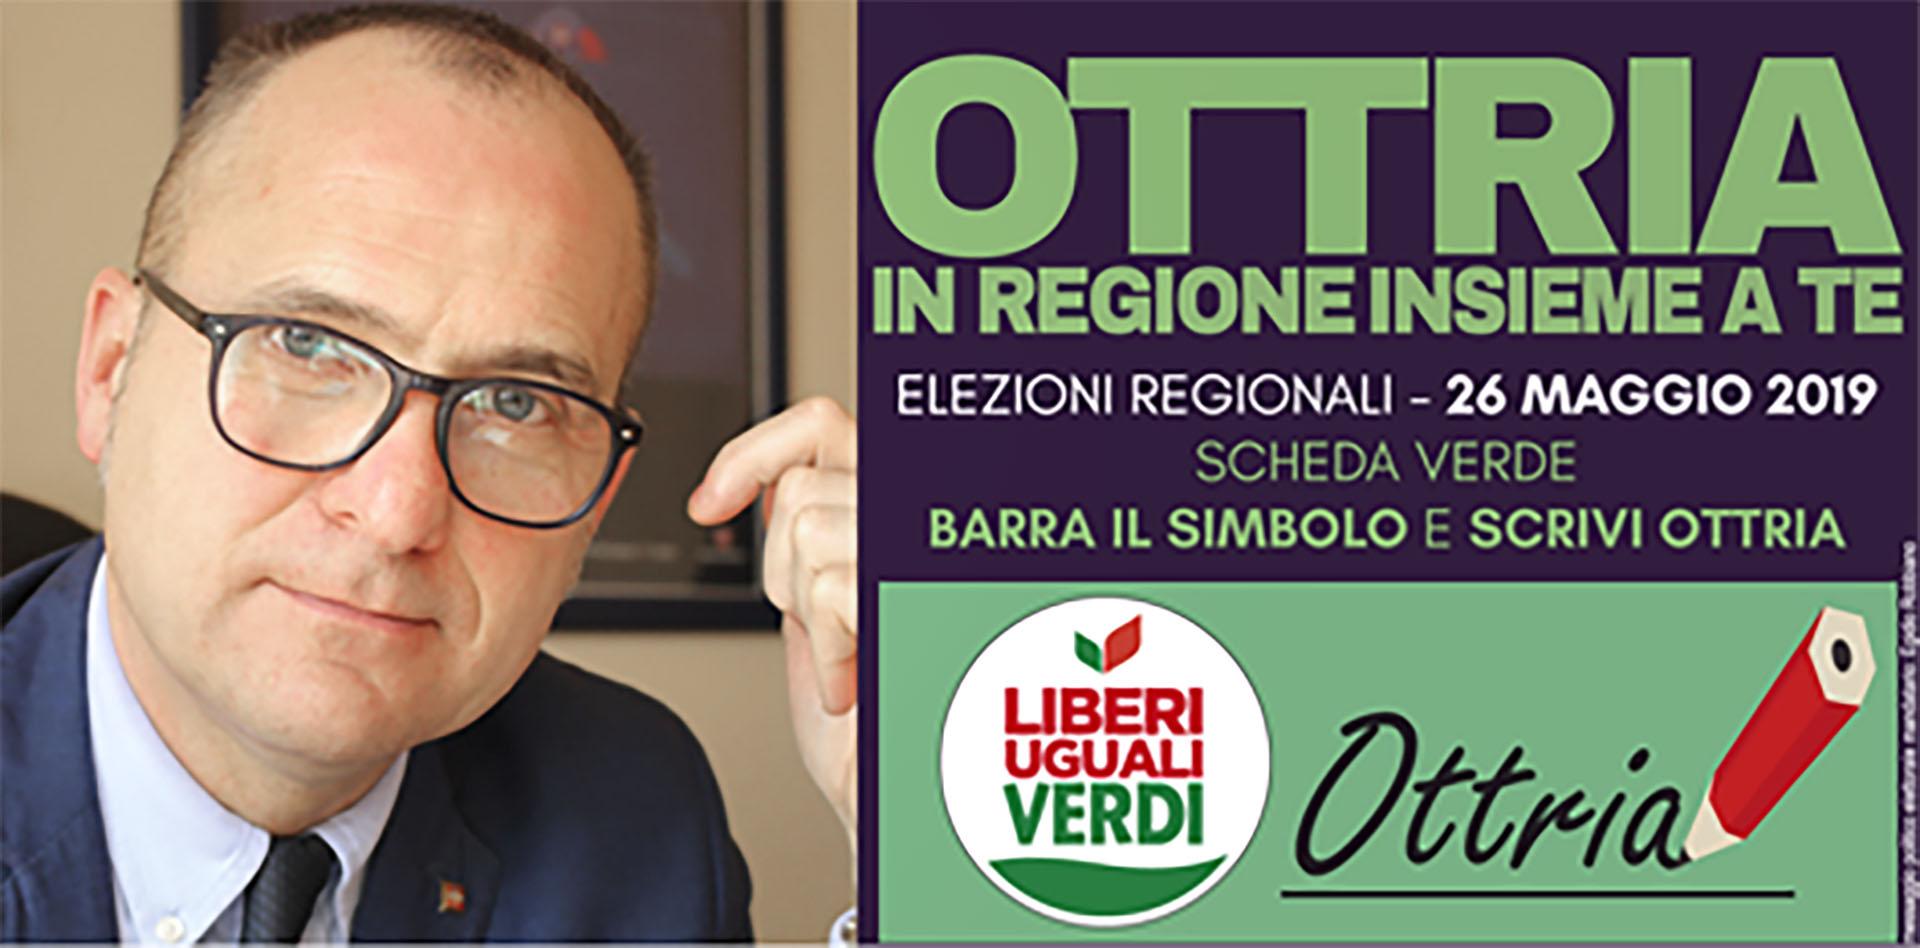 "Elezioni regionali 26 maggio 2019 - ""Ottria in regione insieme a te"""